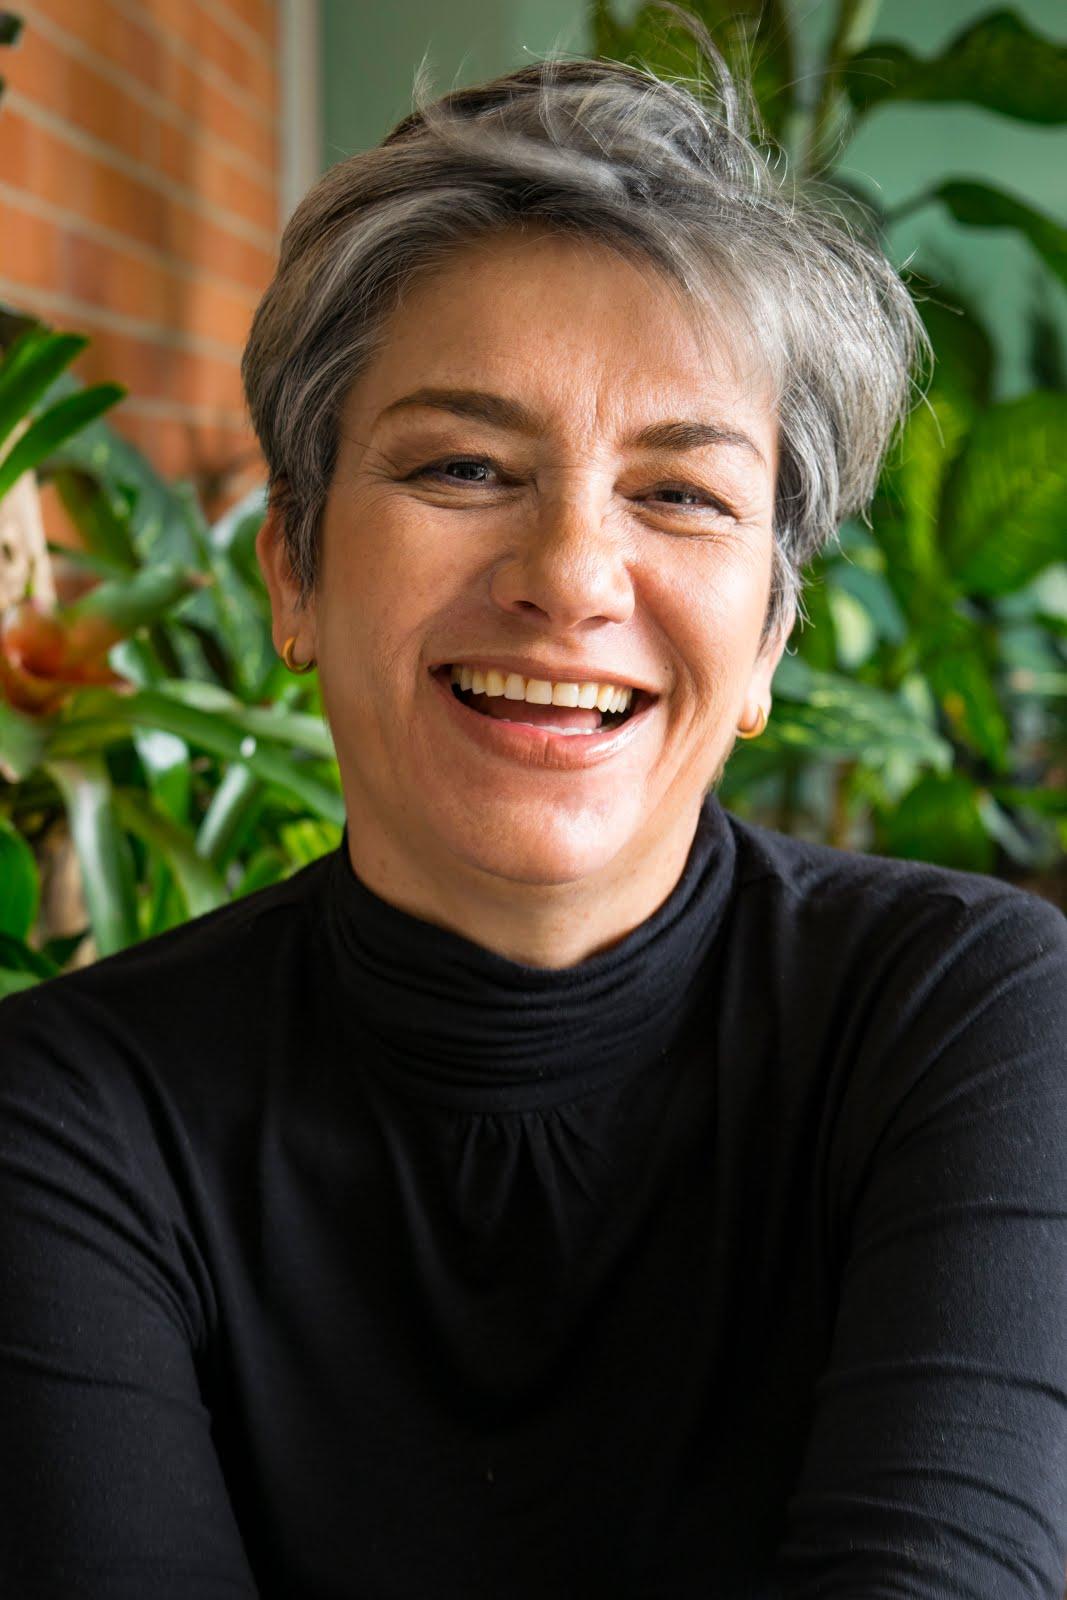 Amparo Velásquez Peñaloza